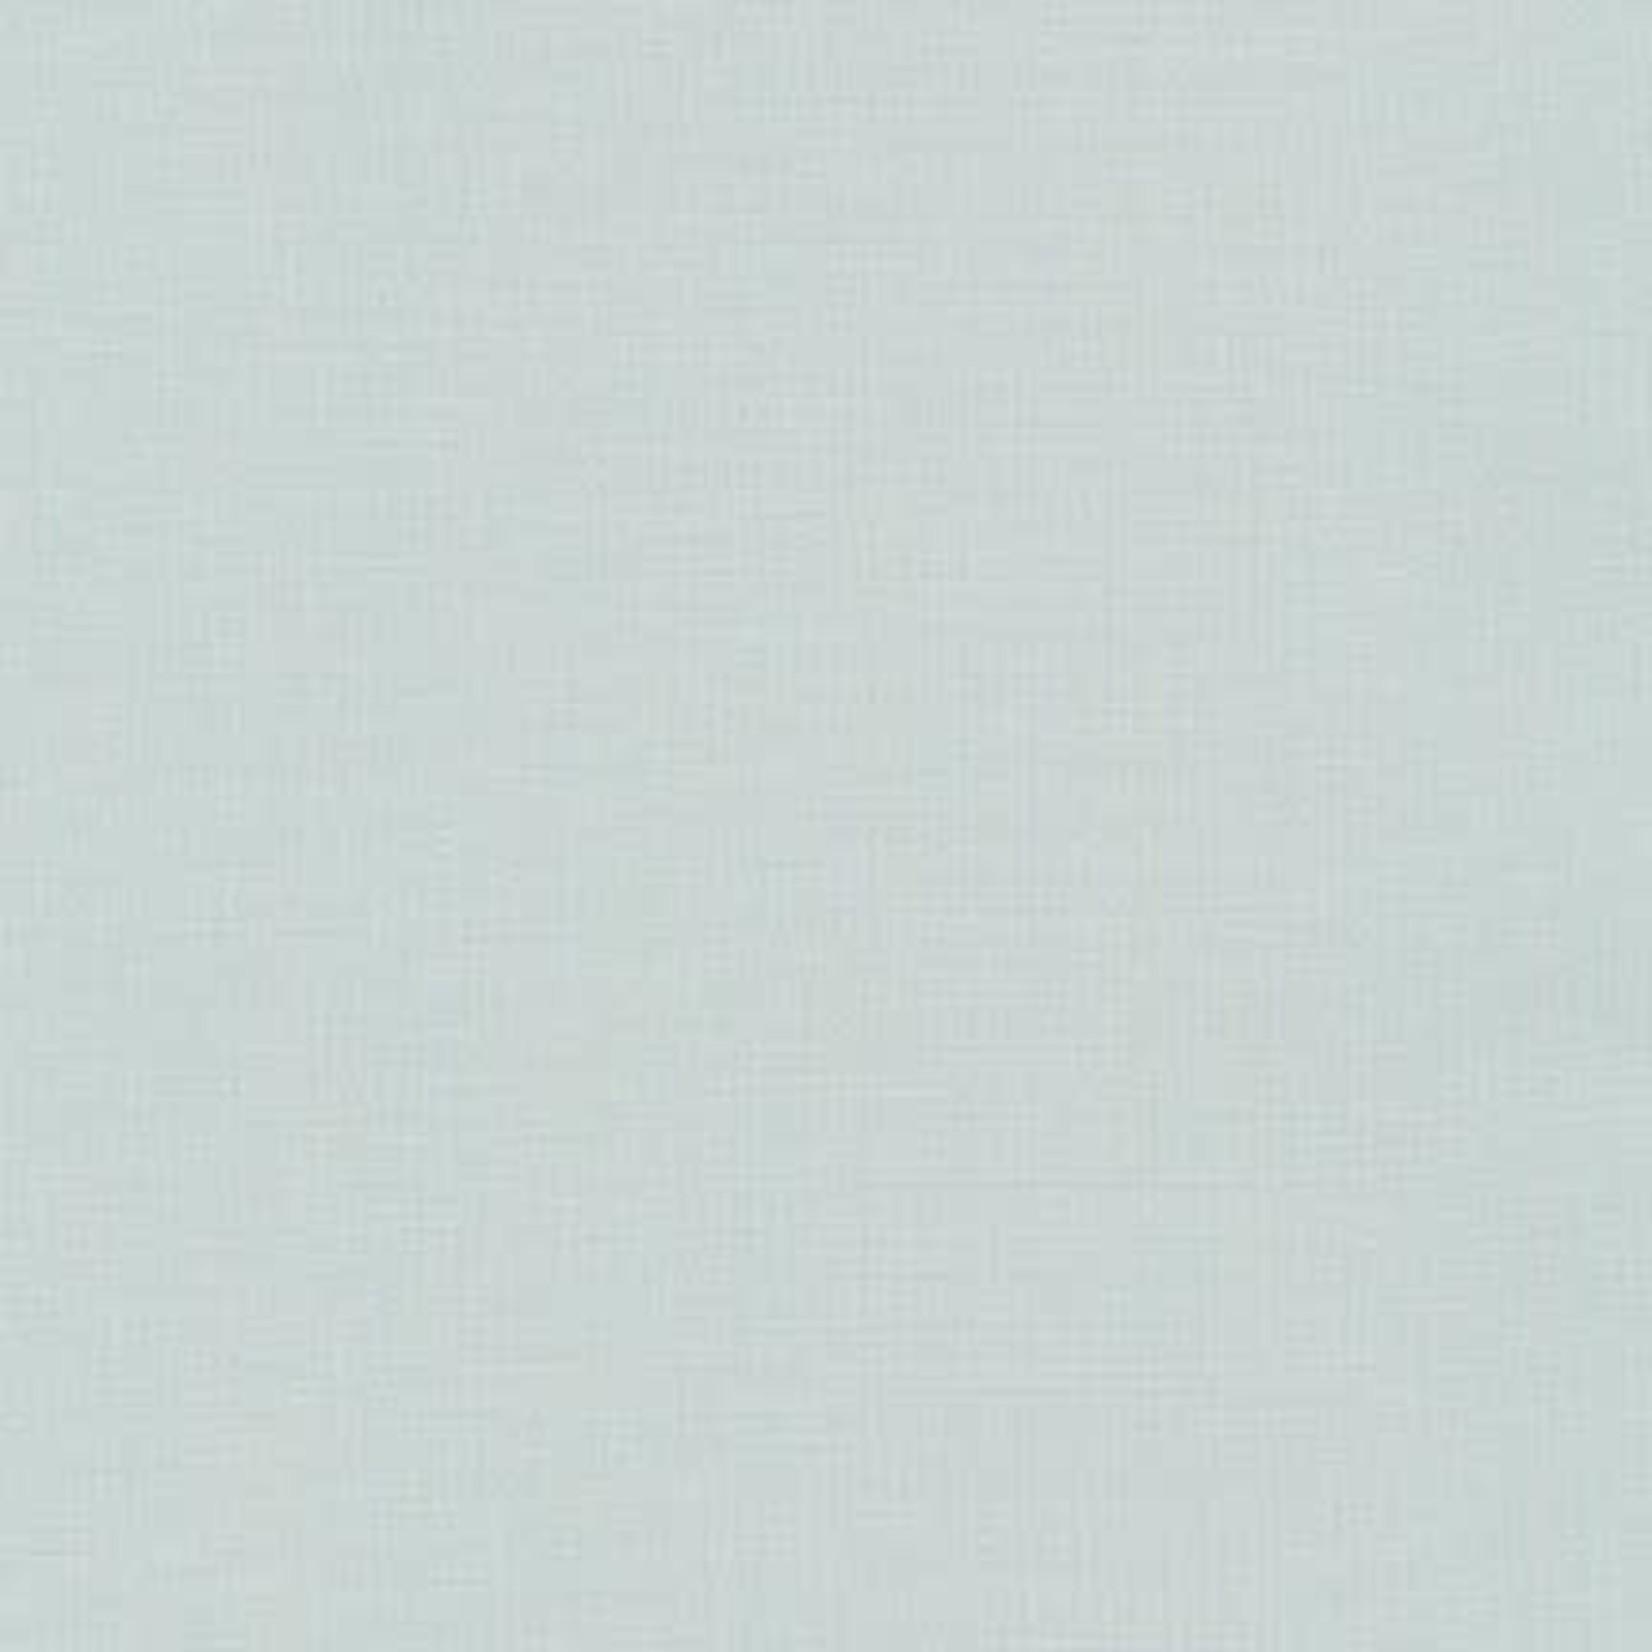 KONA KONA  K001-1847 LIGHTHOUSE, PER CM OR $14/M